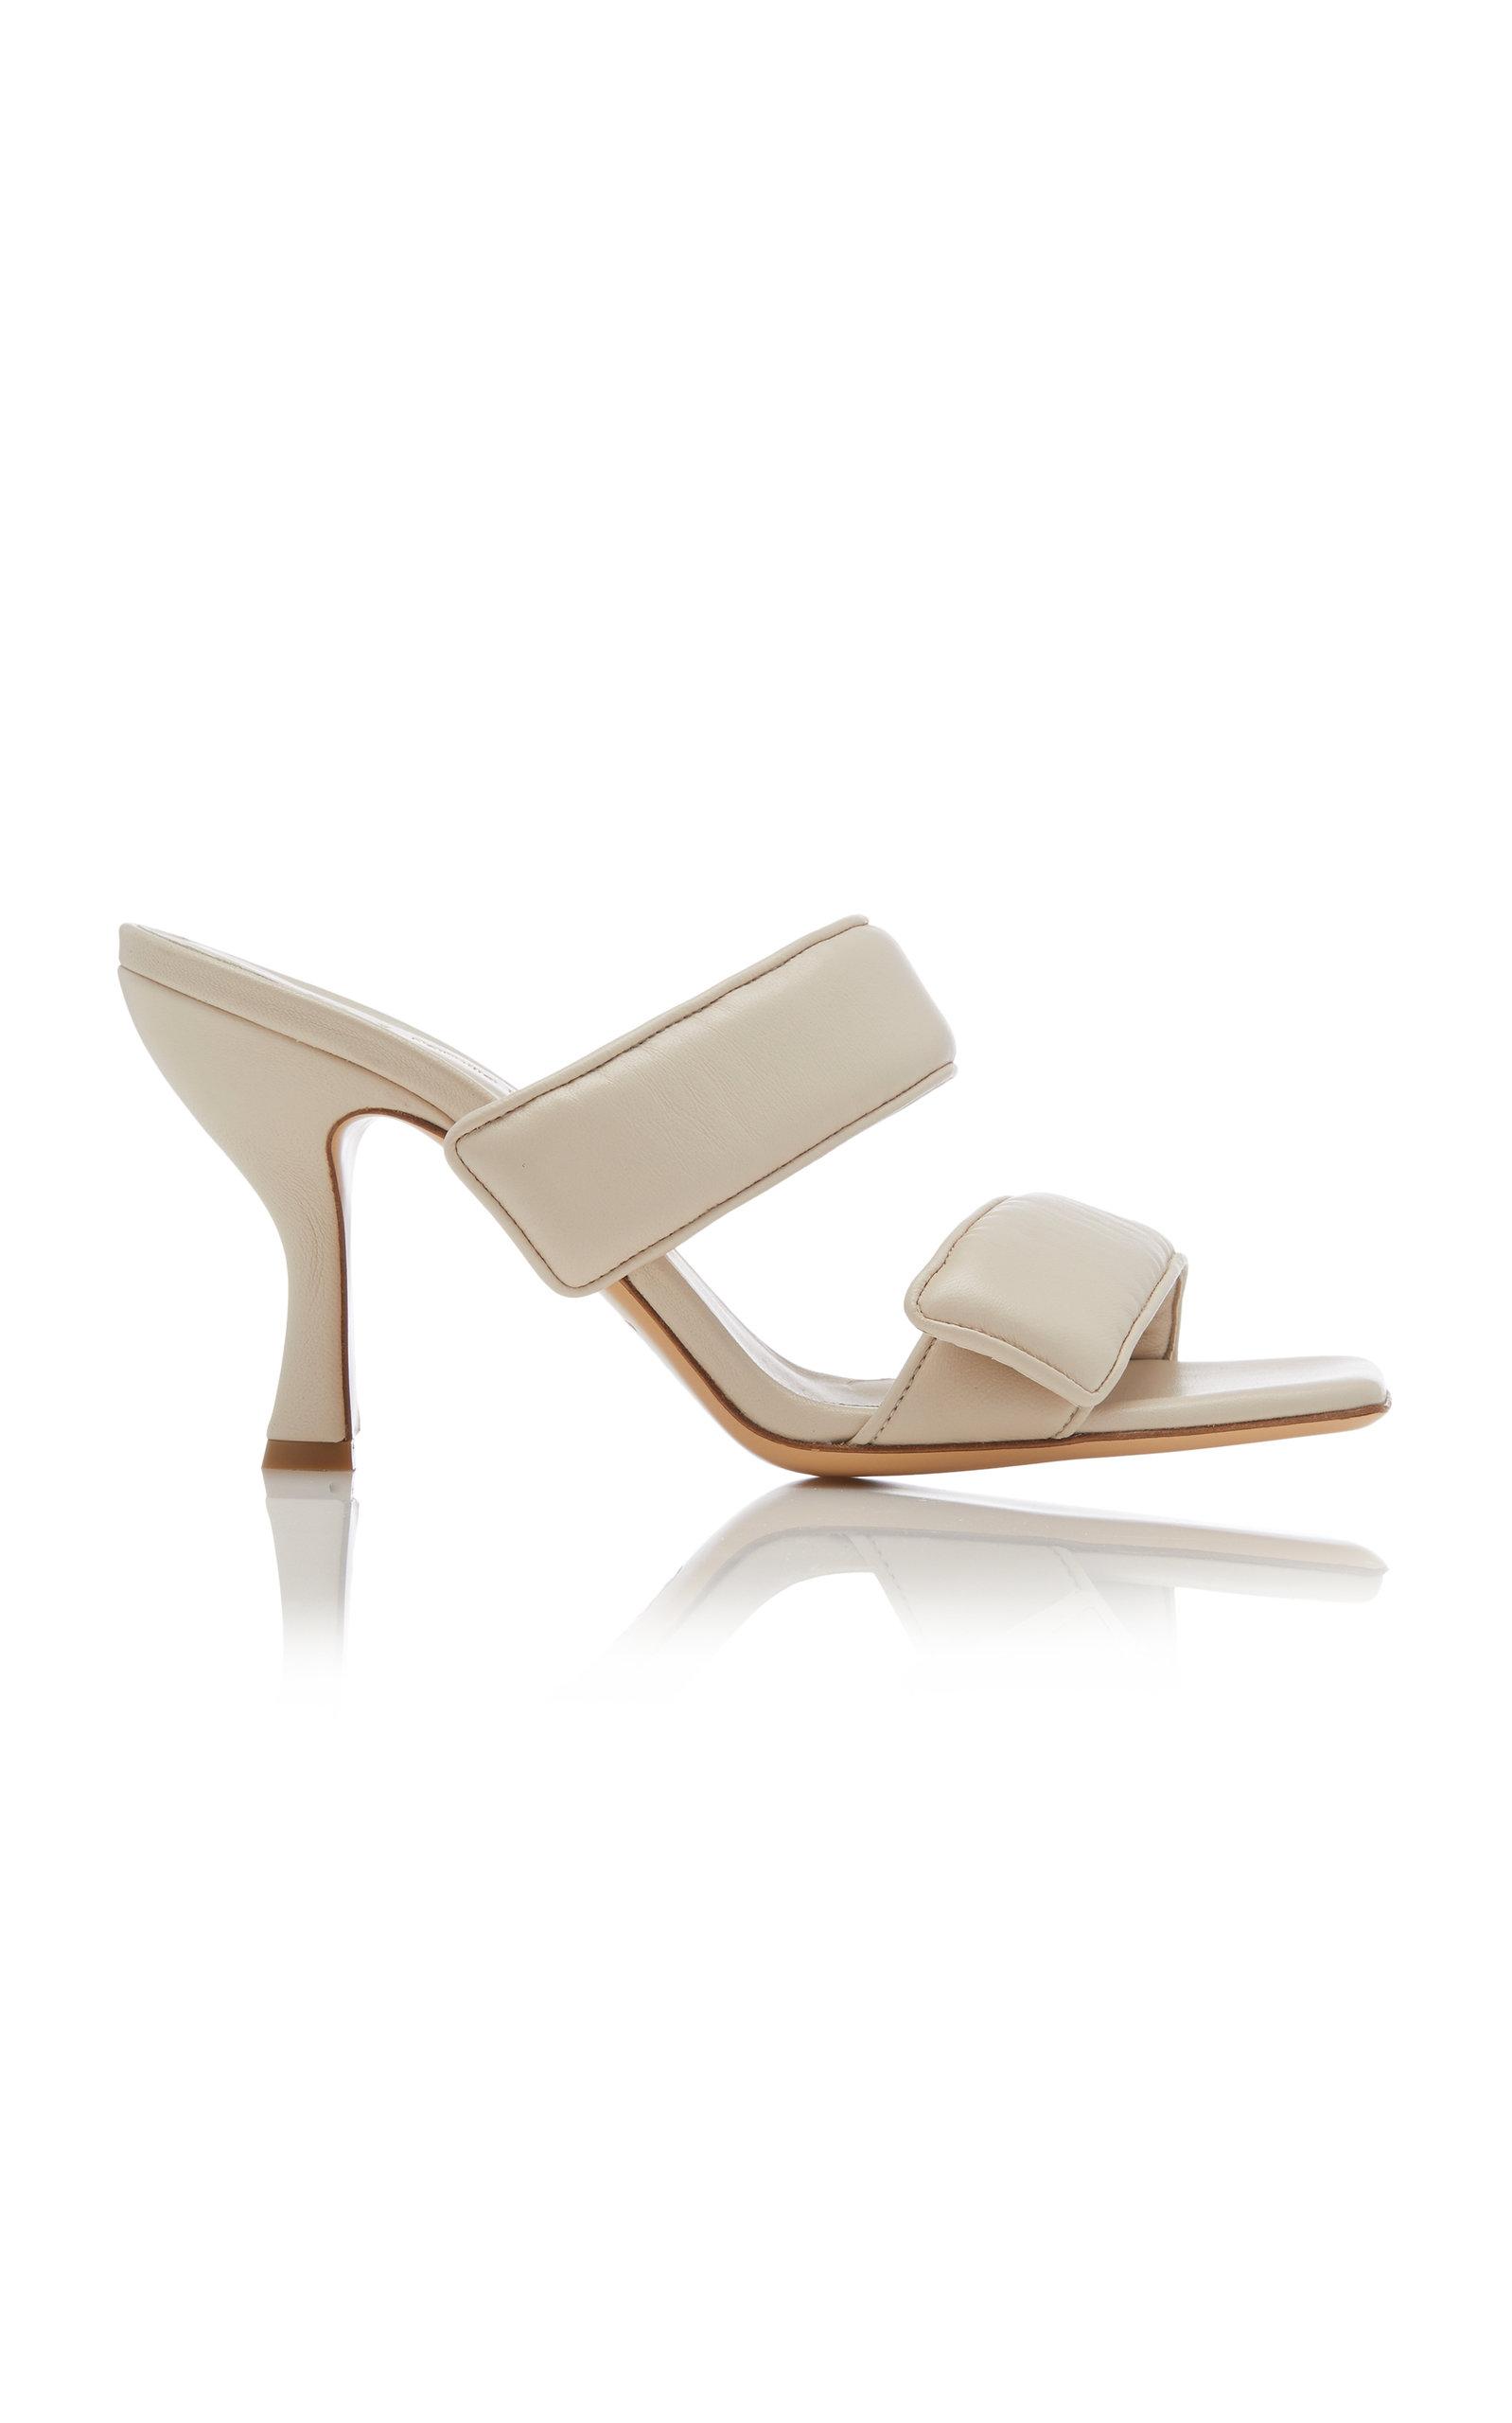 GIA x Pernille Teisbaek - Women's Padded Leather Sandals - Brown/tan - Moda Operandi